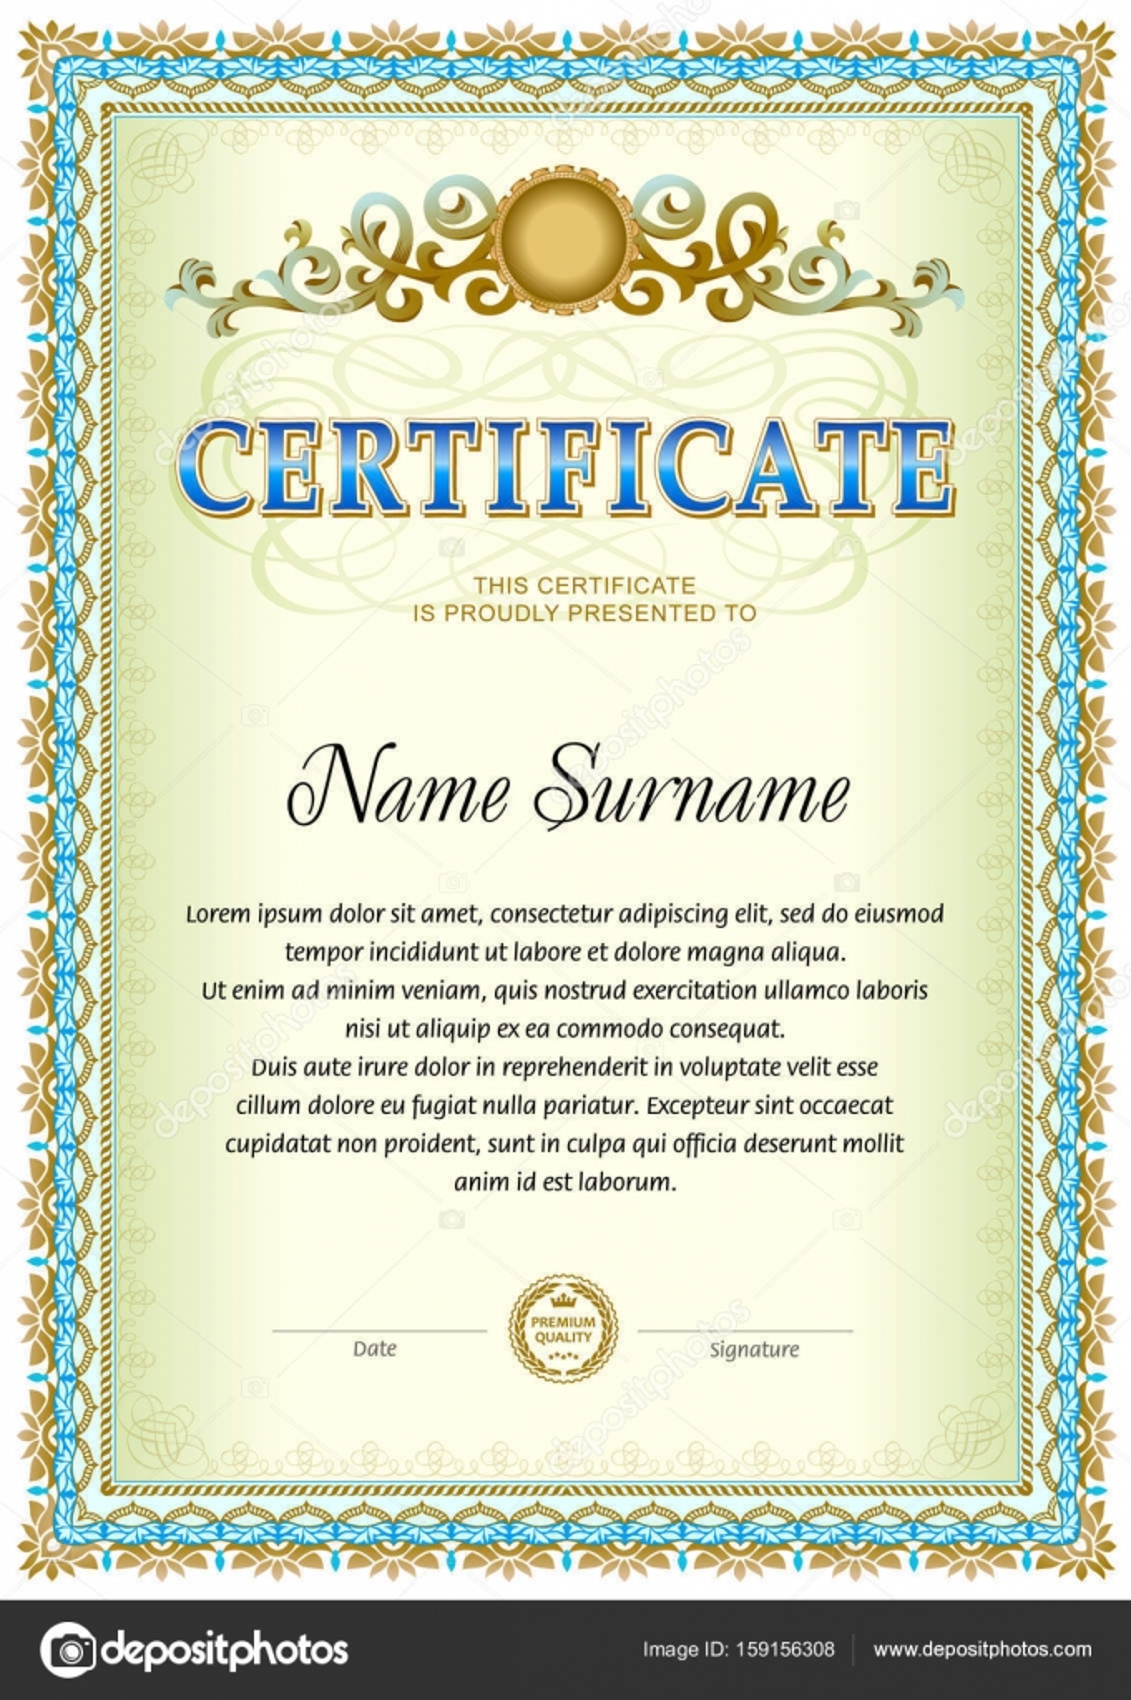 Certificate blank template — Stock Vector © tedgun #159156308